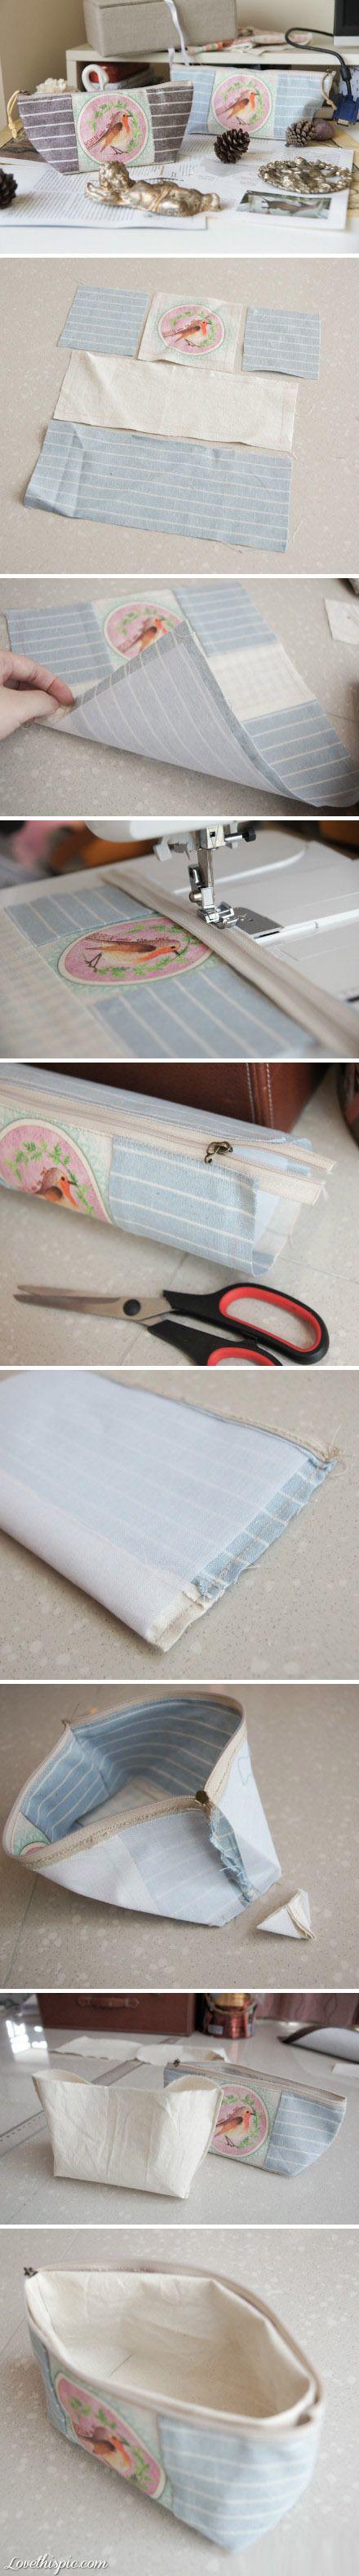 DIY Zipper Bag diy sew craft ……re pinned by Maurie Daboux ❤╰☆╮